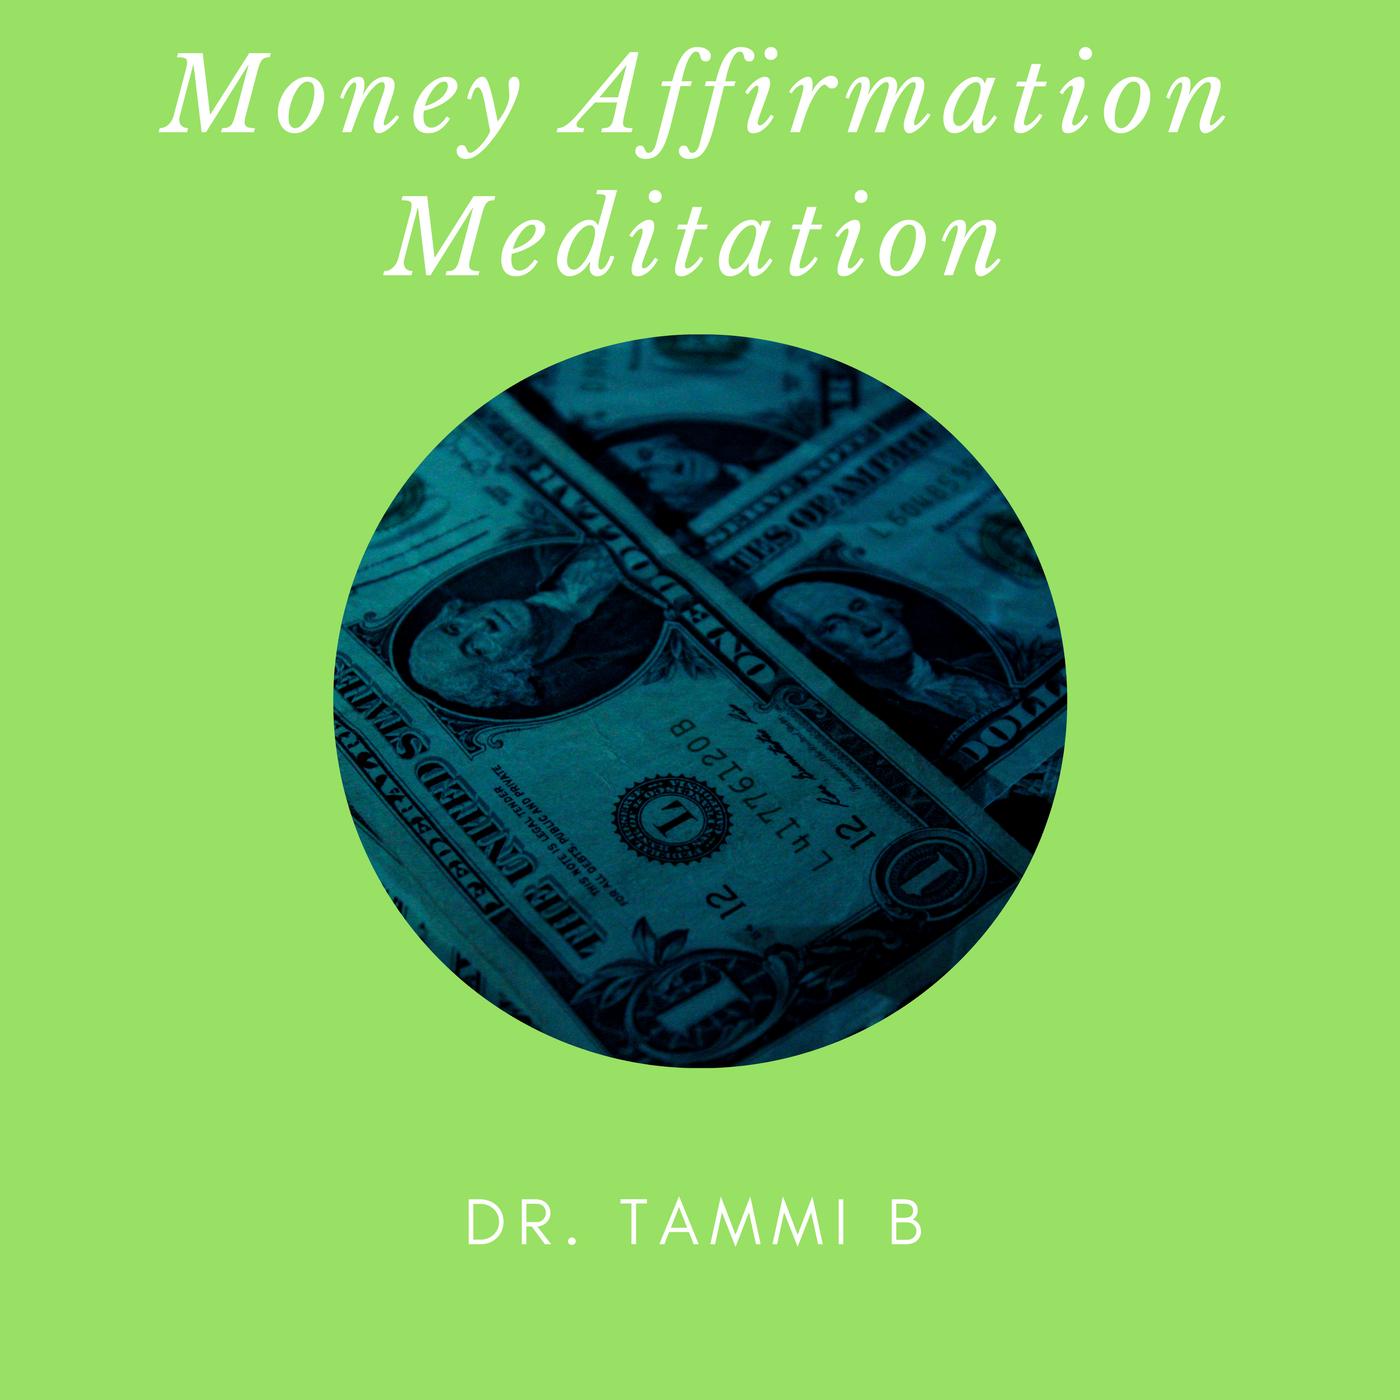 Money Affirmation Meditation